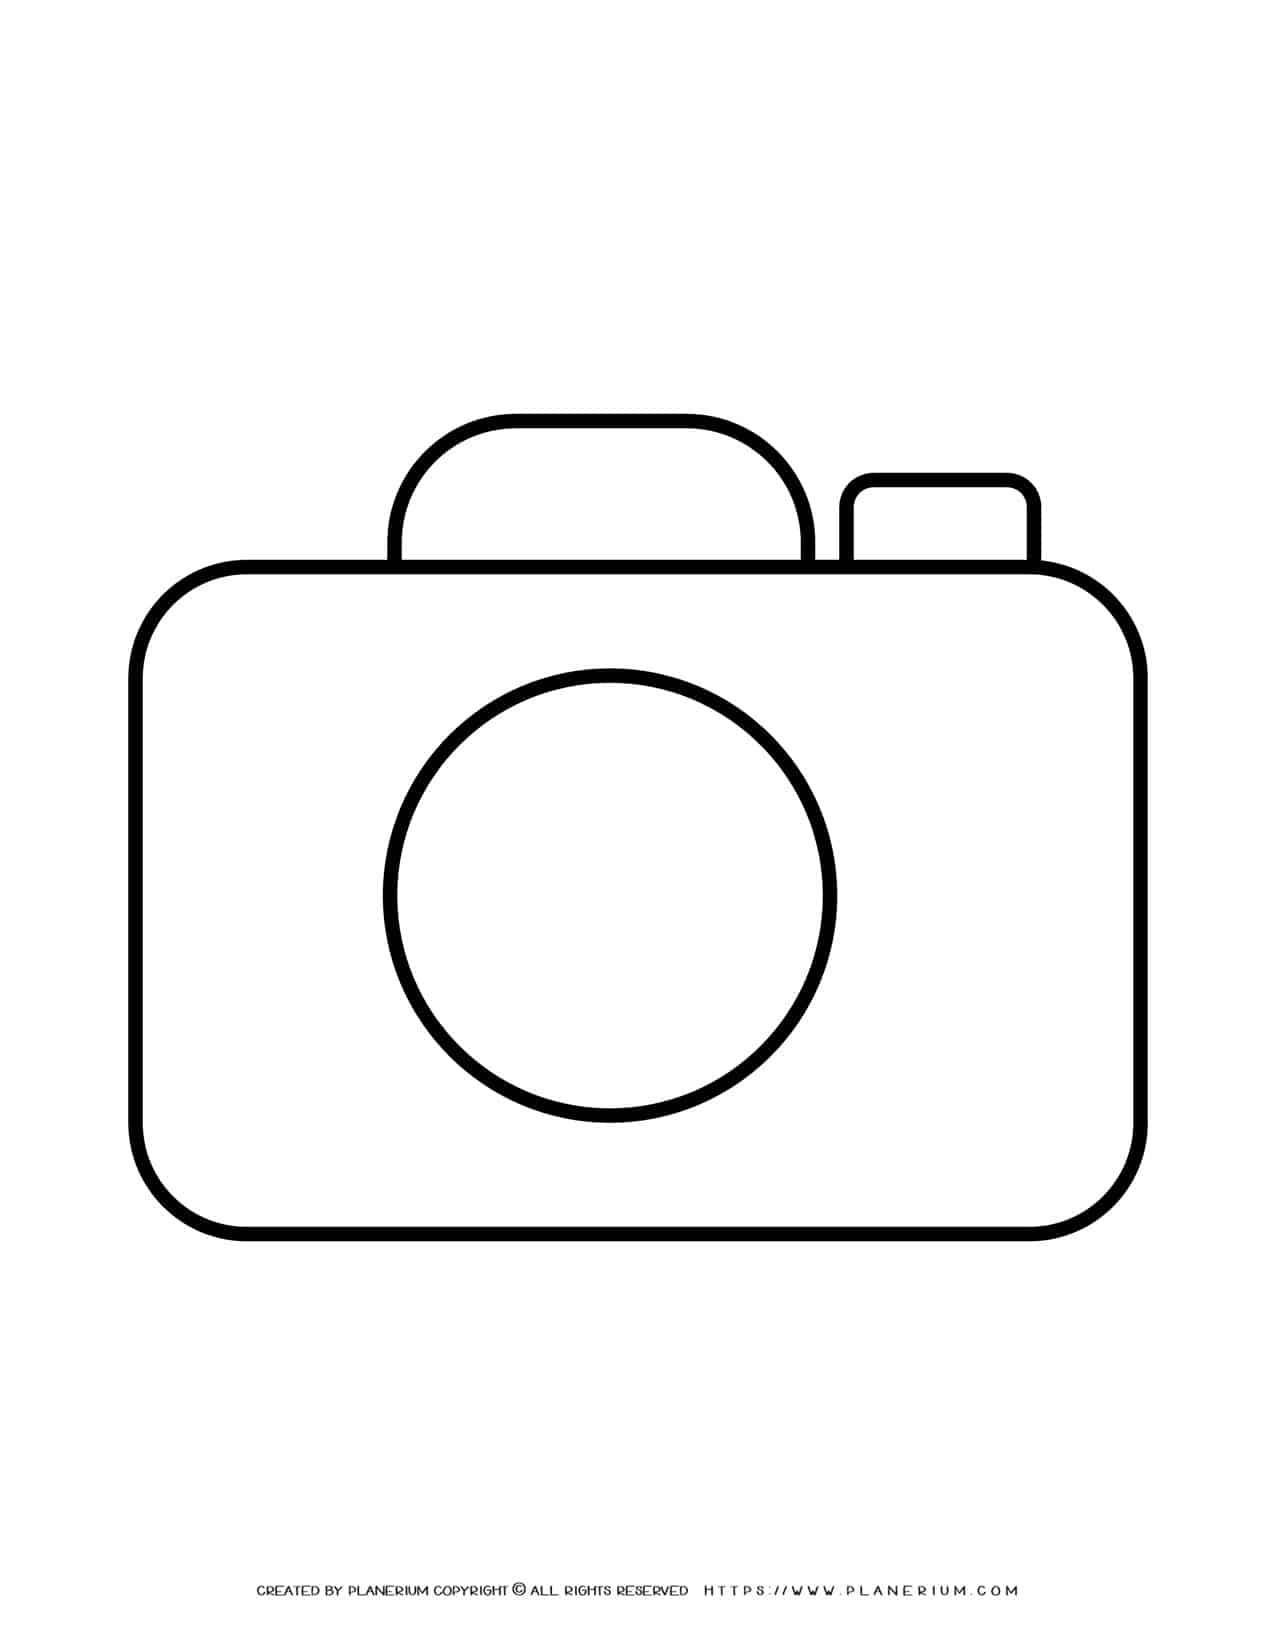 Camera Outline | Planerium